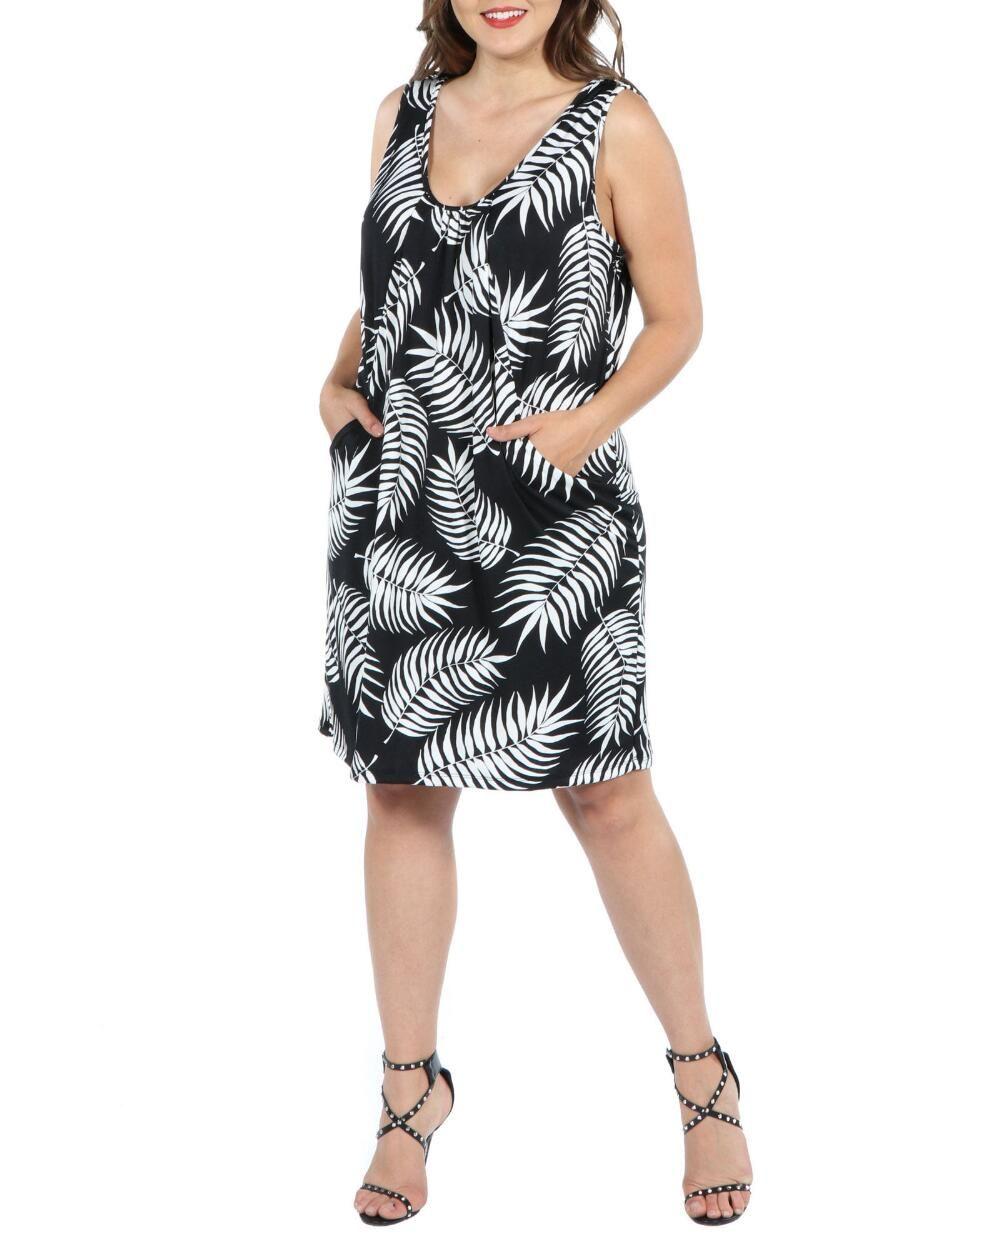 Women S Plus Size Mini Dress With Pockets 24seven Comfort Apparel Brand Stein Mart In 2020 Mini Dress Plus Size Mini Dresses Dresses [ 1250 x 1000 Pixel ]